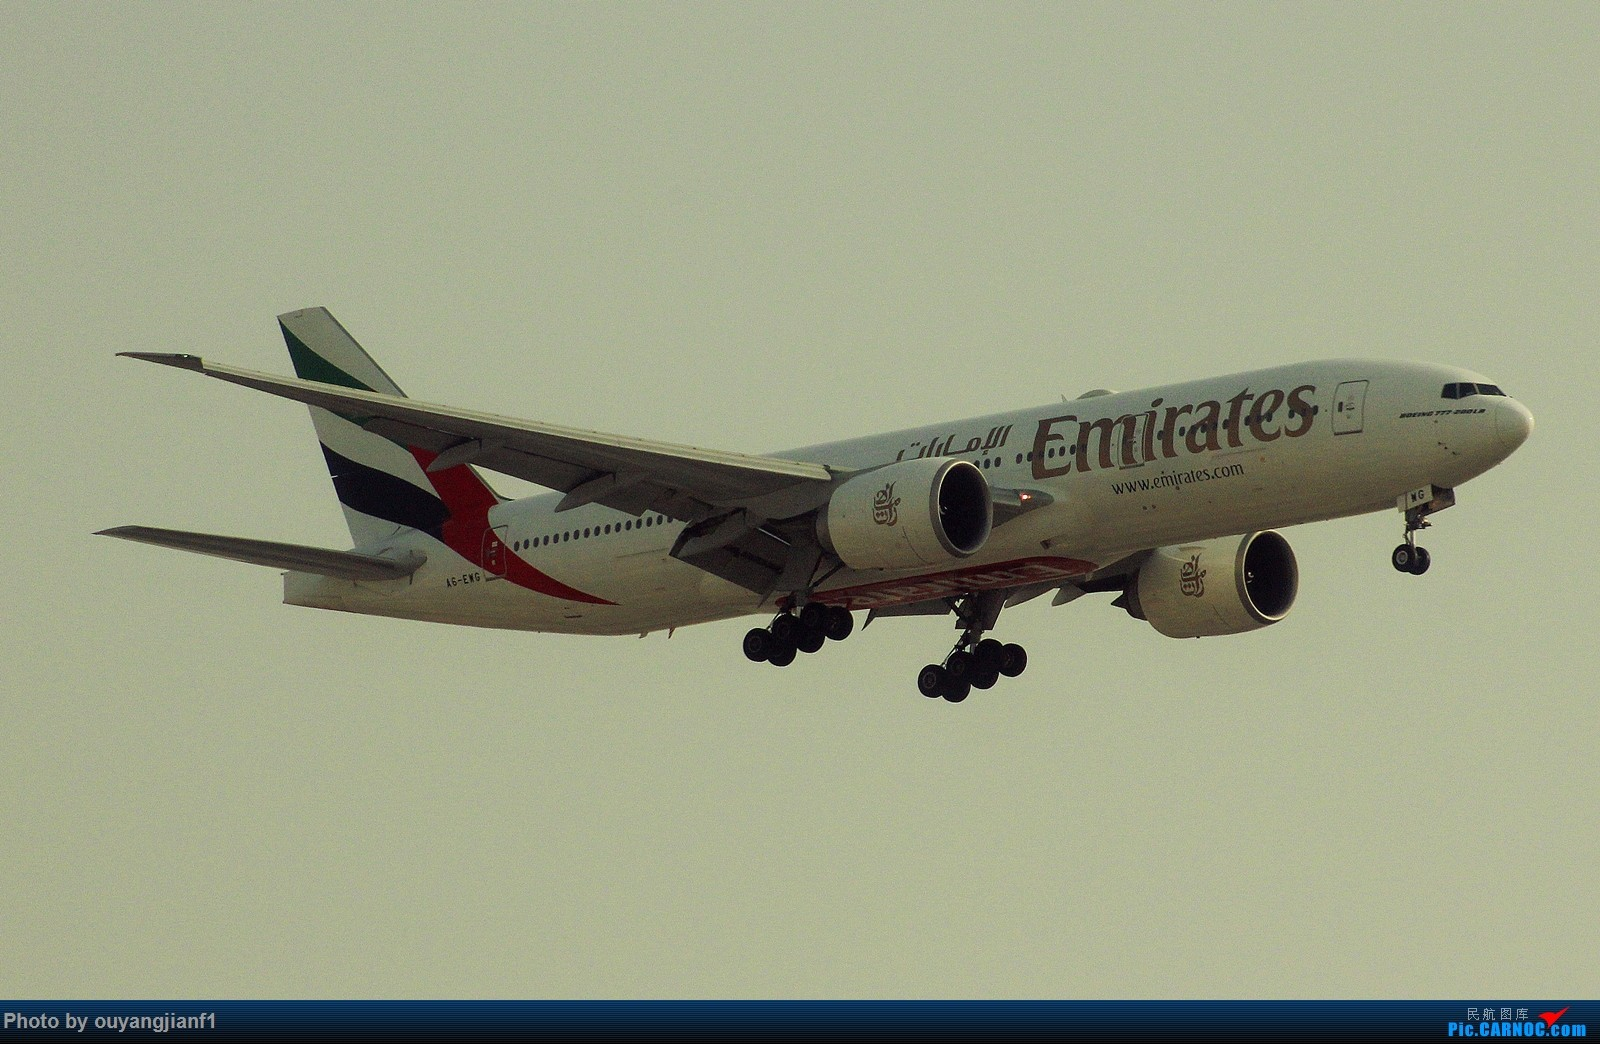 Re:[原创]很多年没有来贴图区了,记一次本不在计划中的迪拜拍机之行,在漫天黄沙中EK的380和777真的看到吐血.... BOEING 777-200LR A6-EWG 阿拉伯联合酋长国迪拜国际机场